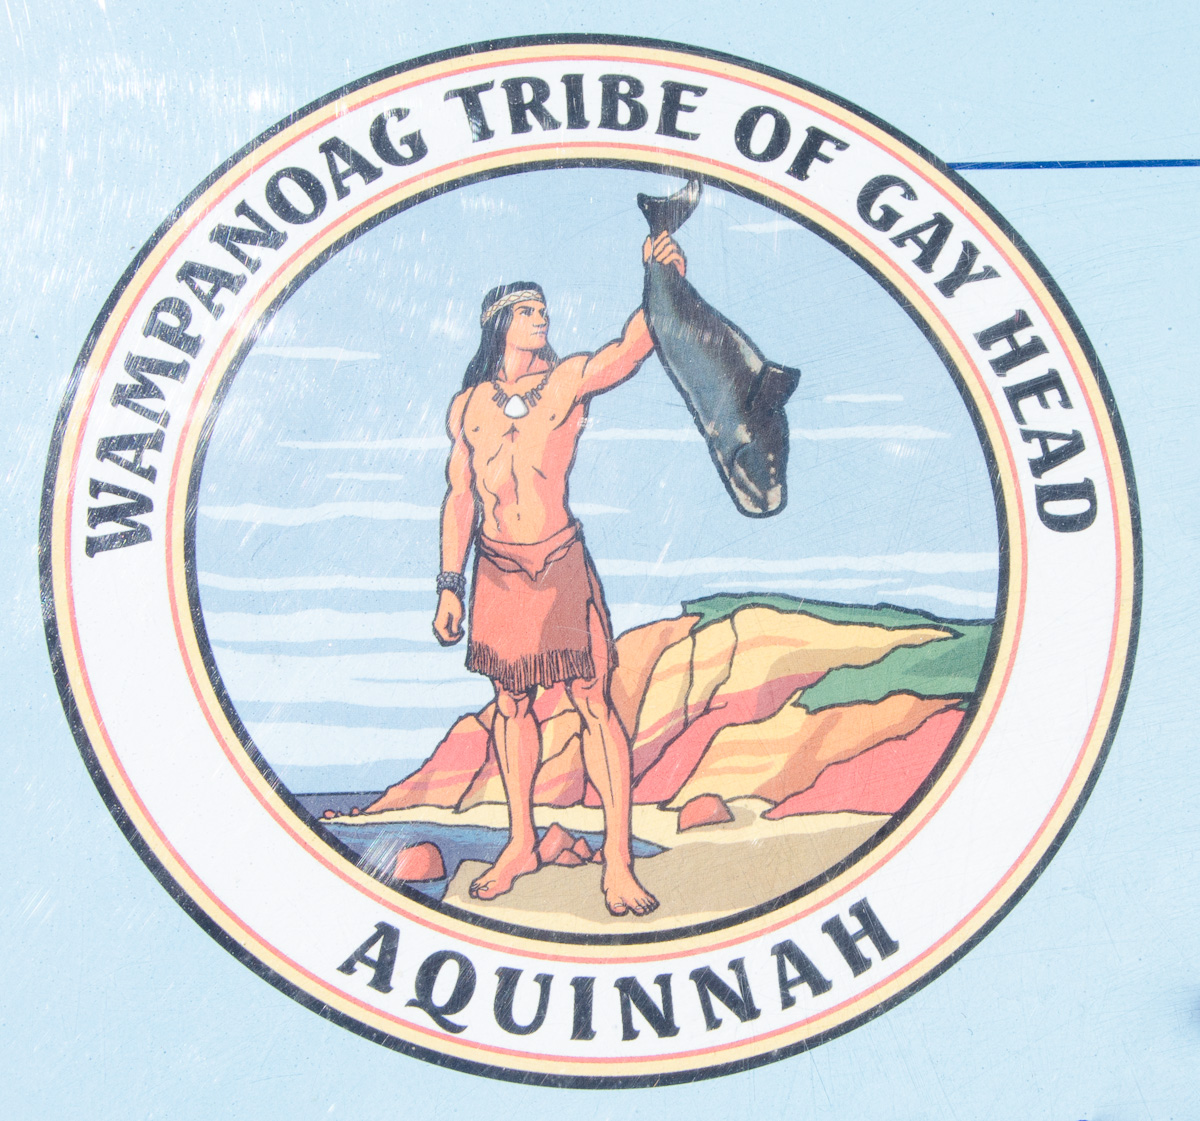 from Eric wampanoag tribe of gay head aquinnah